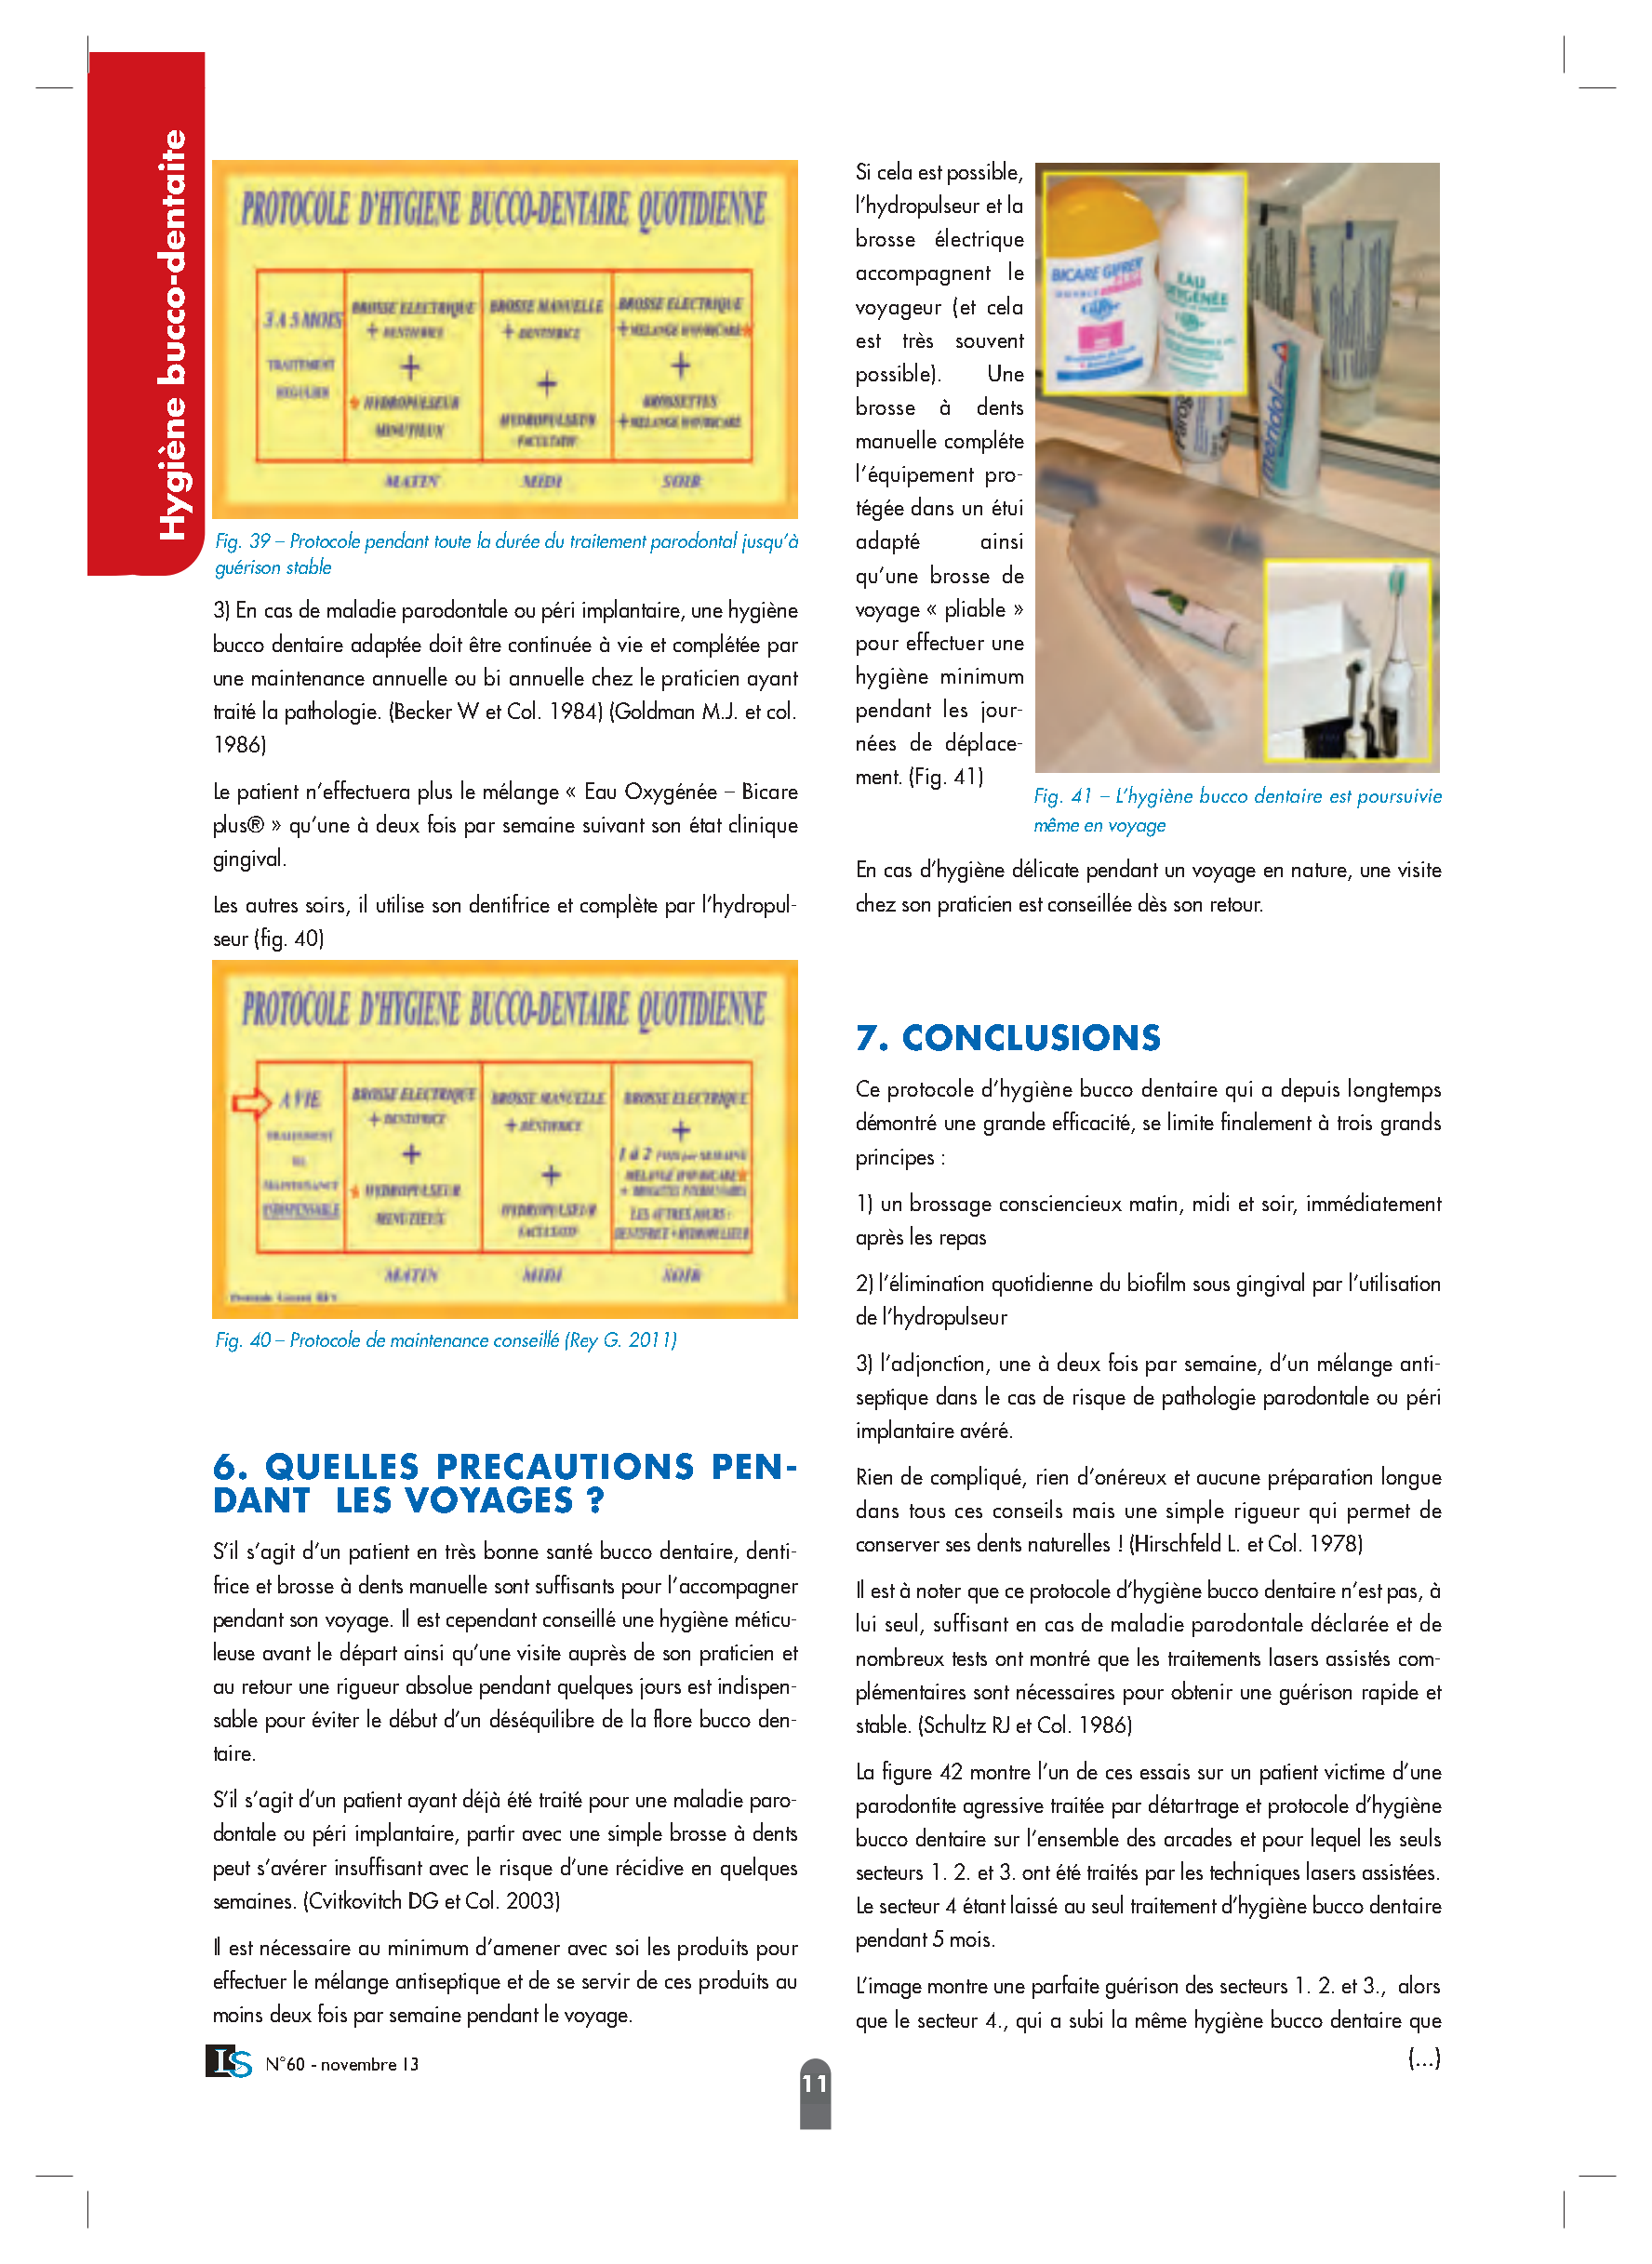 Etude11-page11